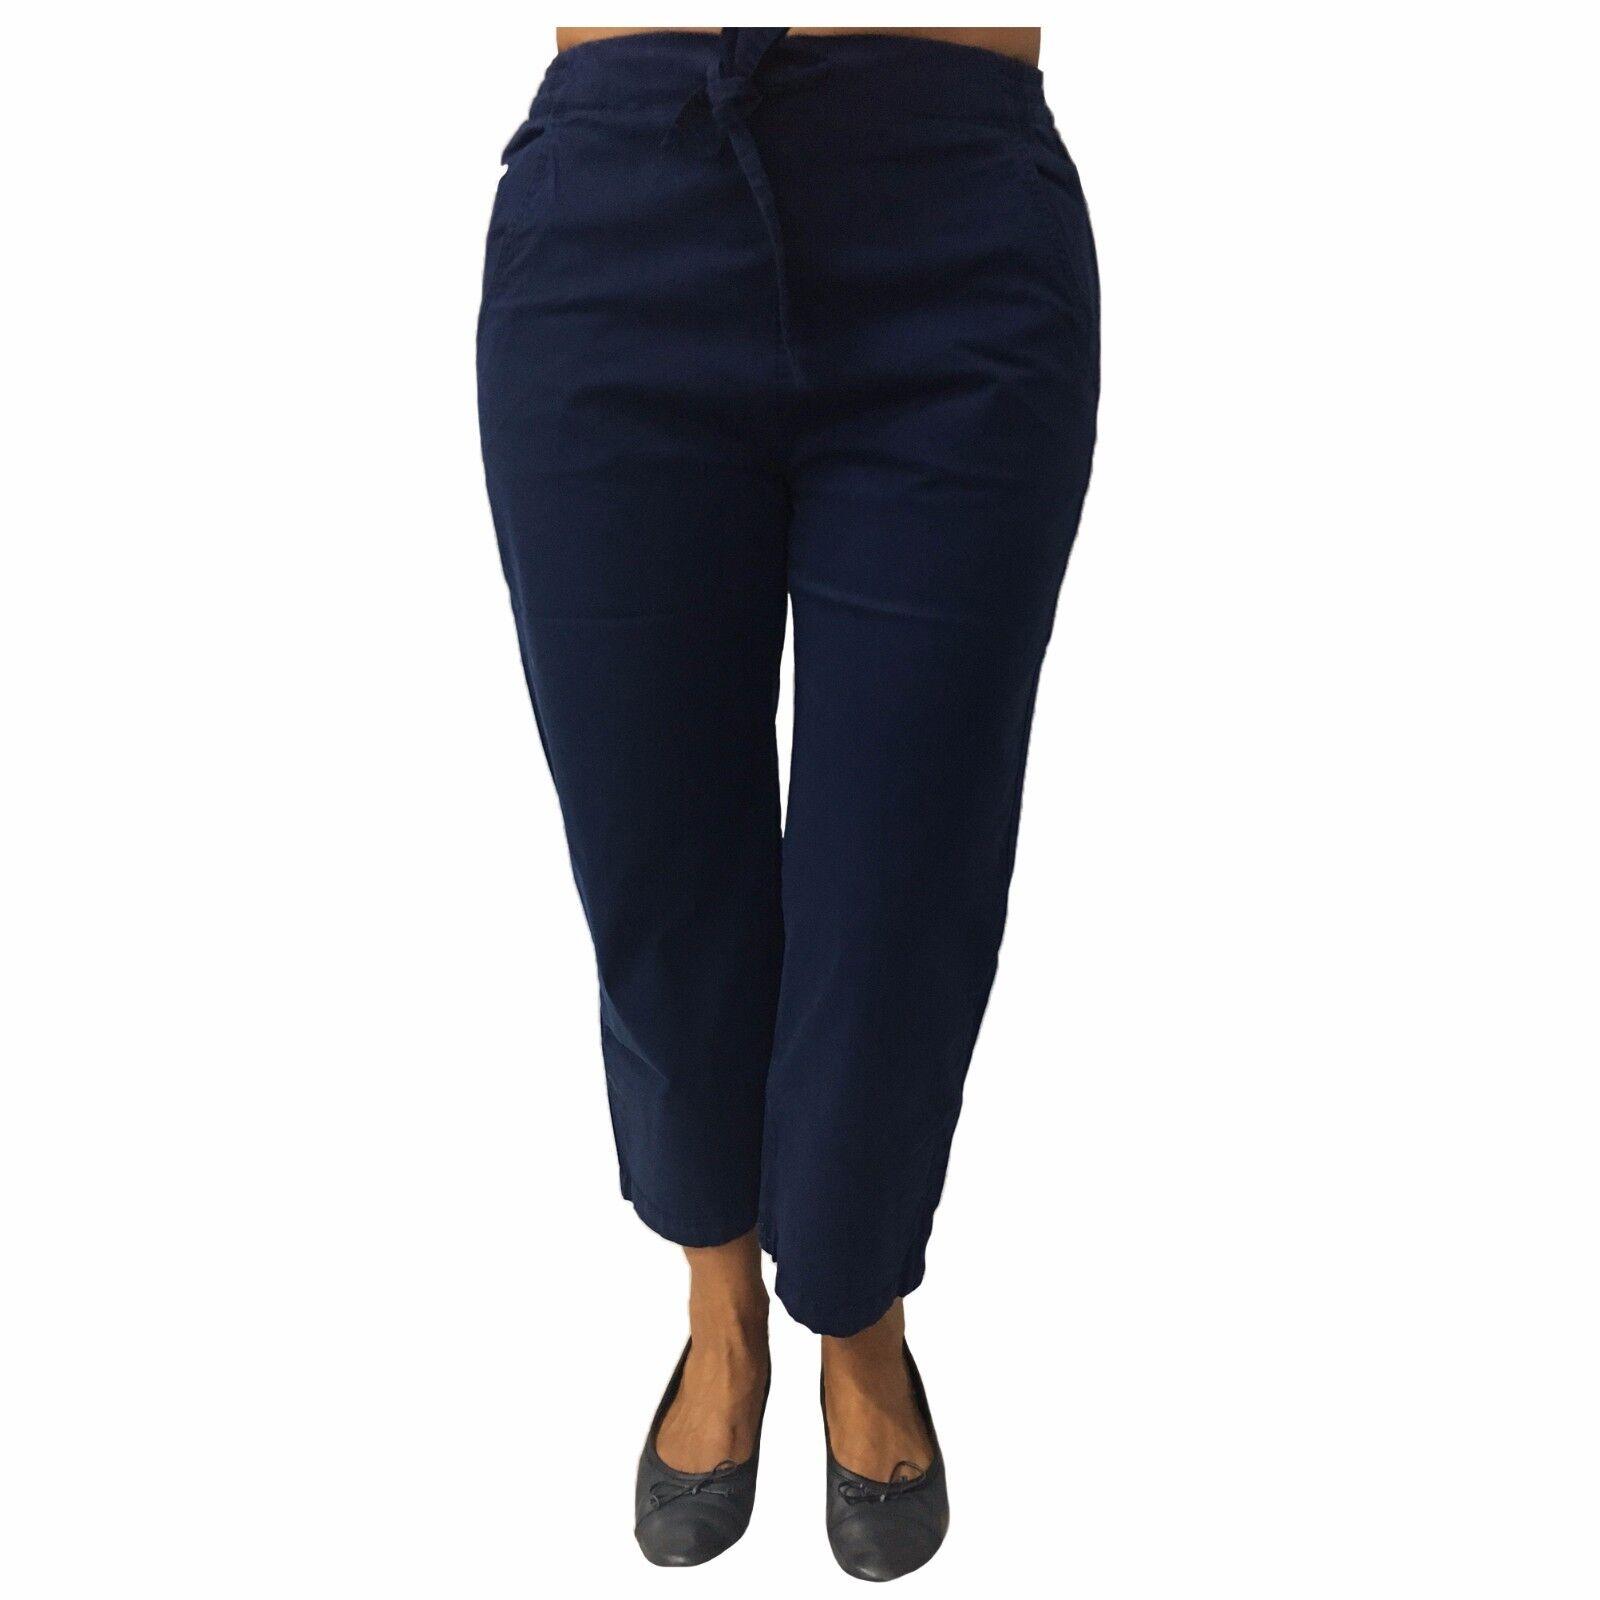 LE PHARE DE LA BALEINE women's trousers bluee ink mod BAF38406 97% cotton